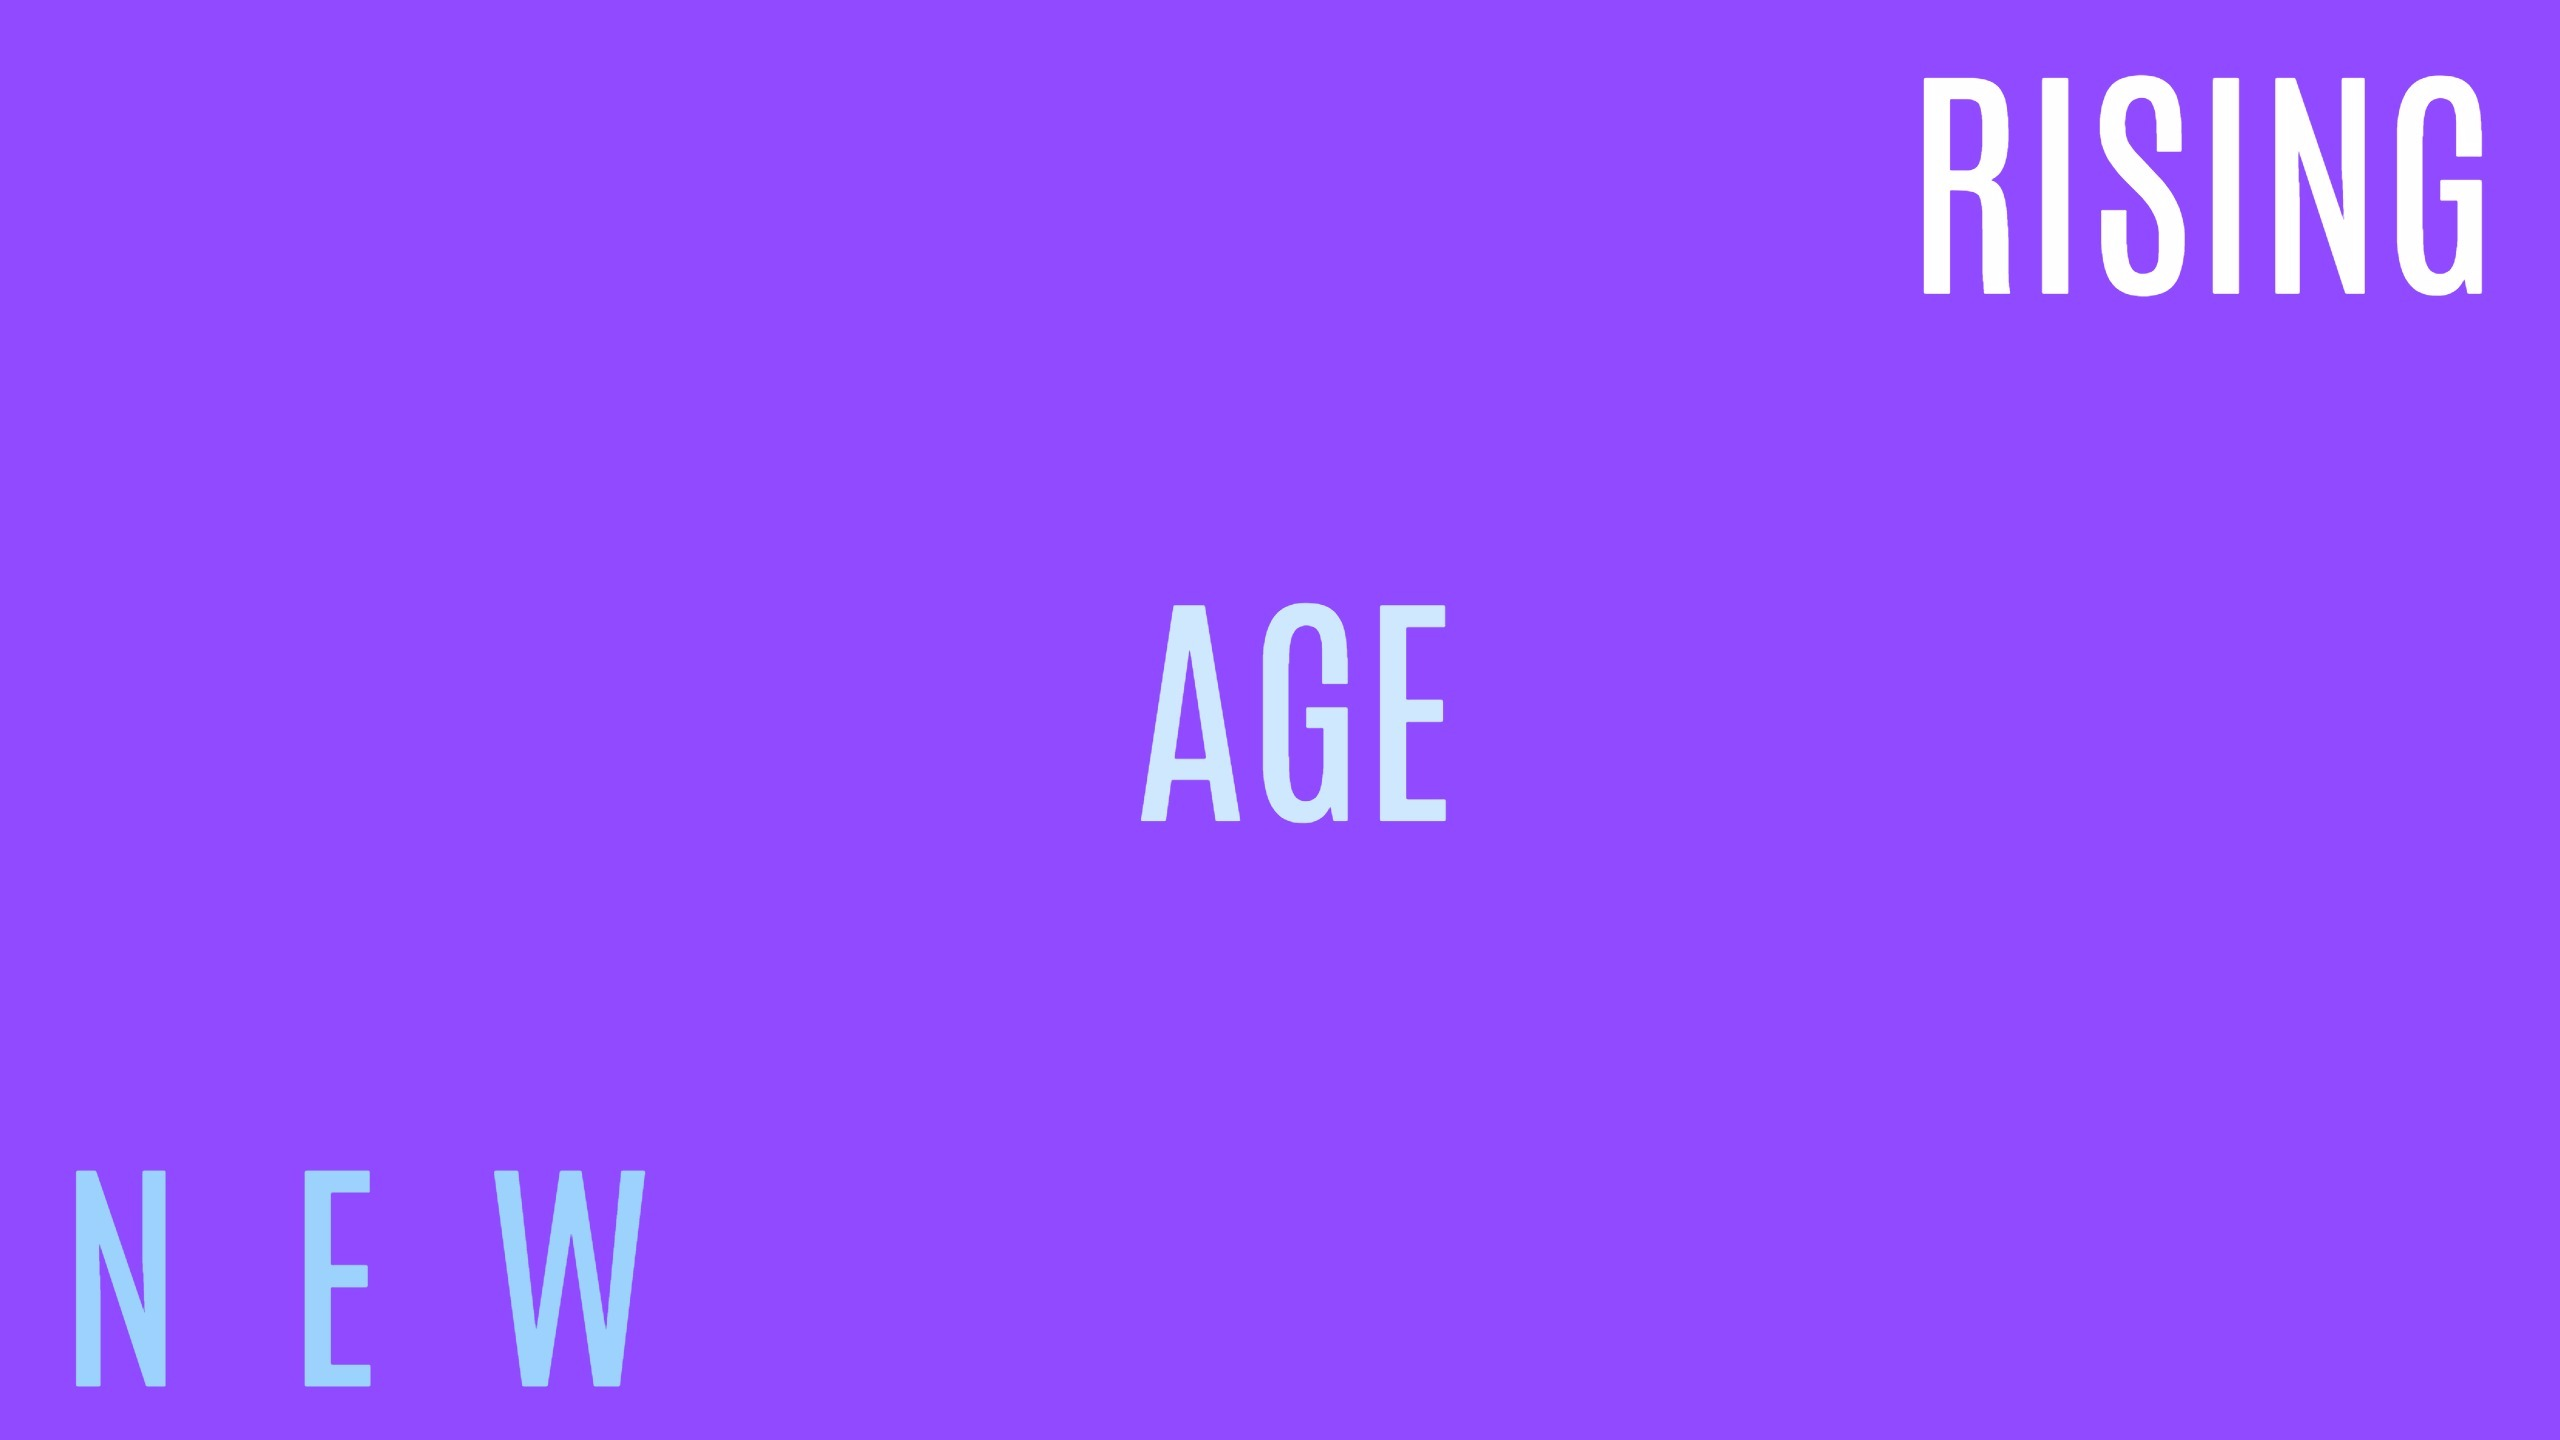 new age rising 2 (1)